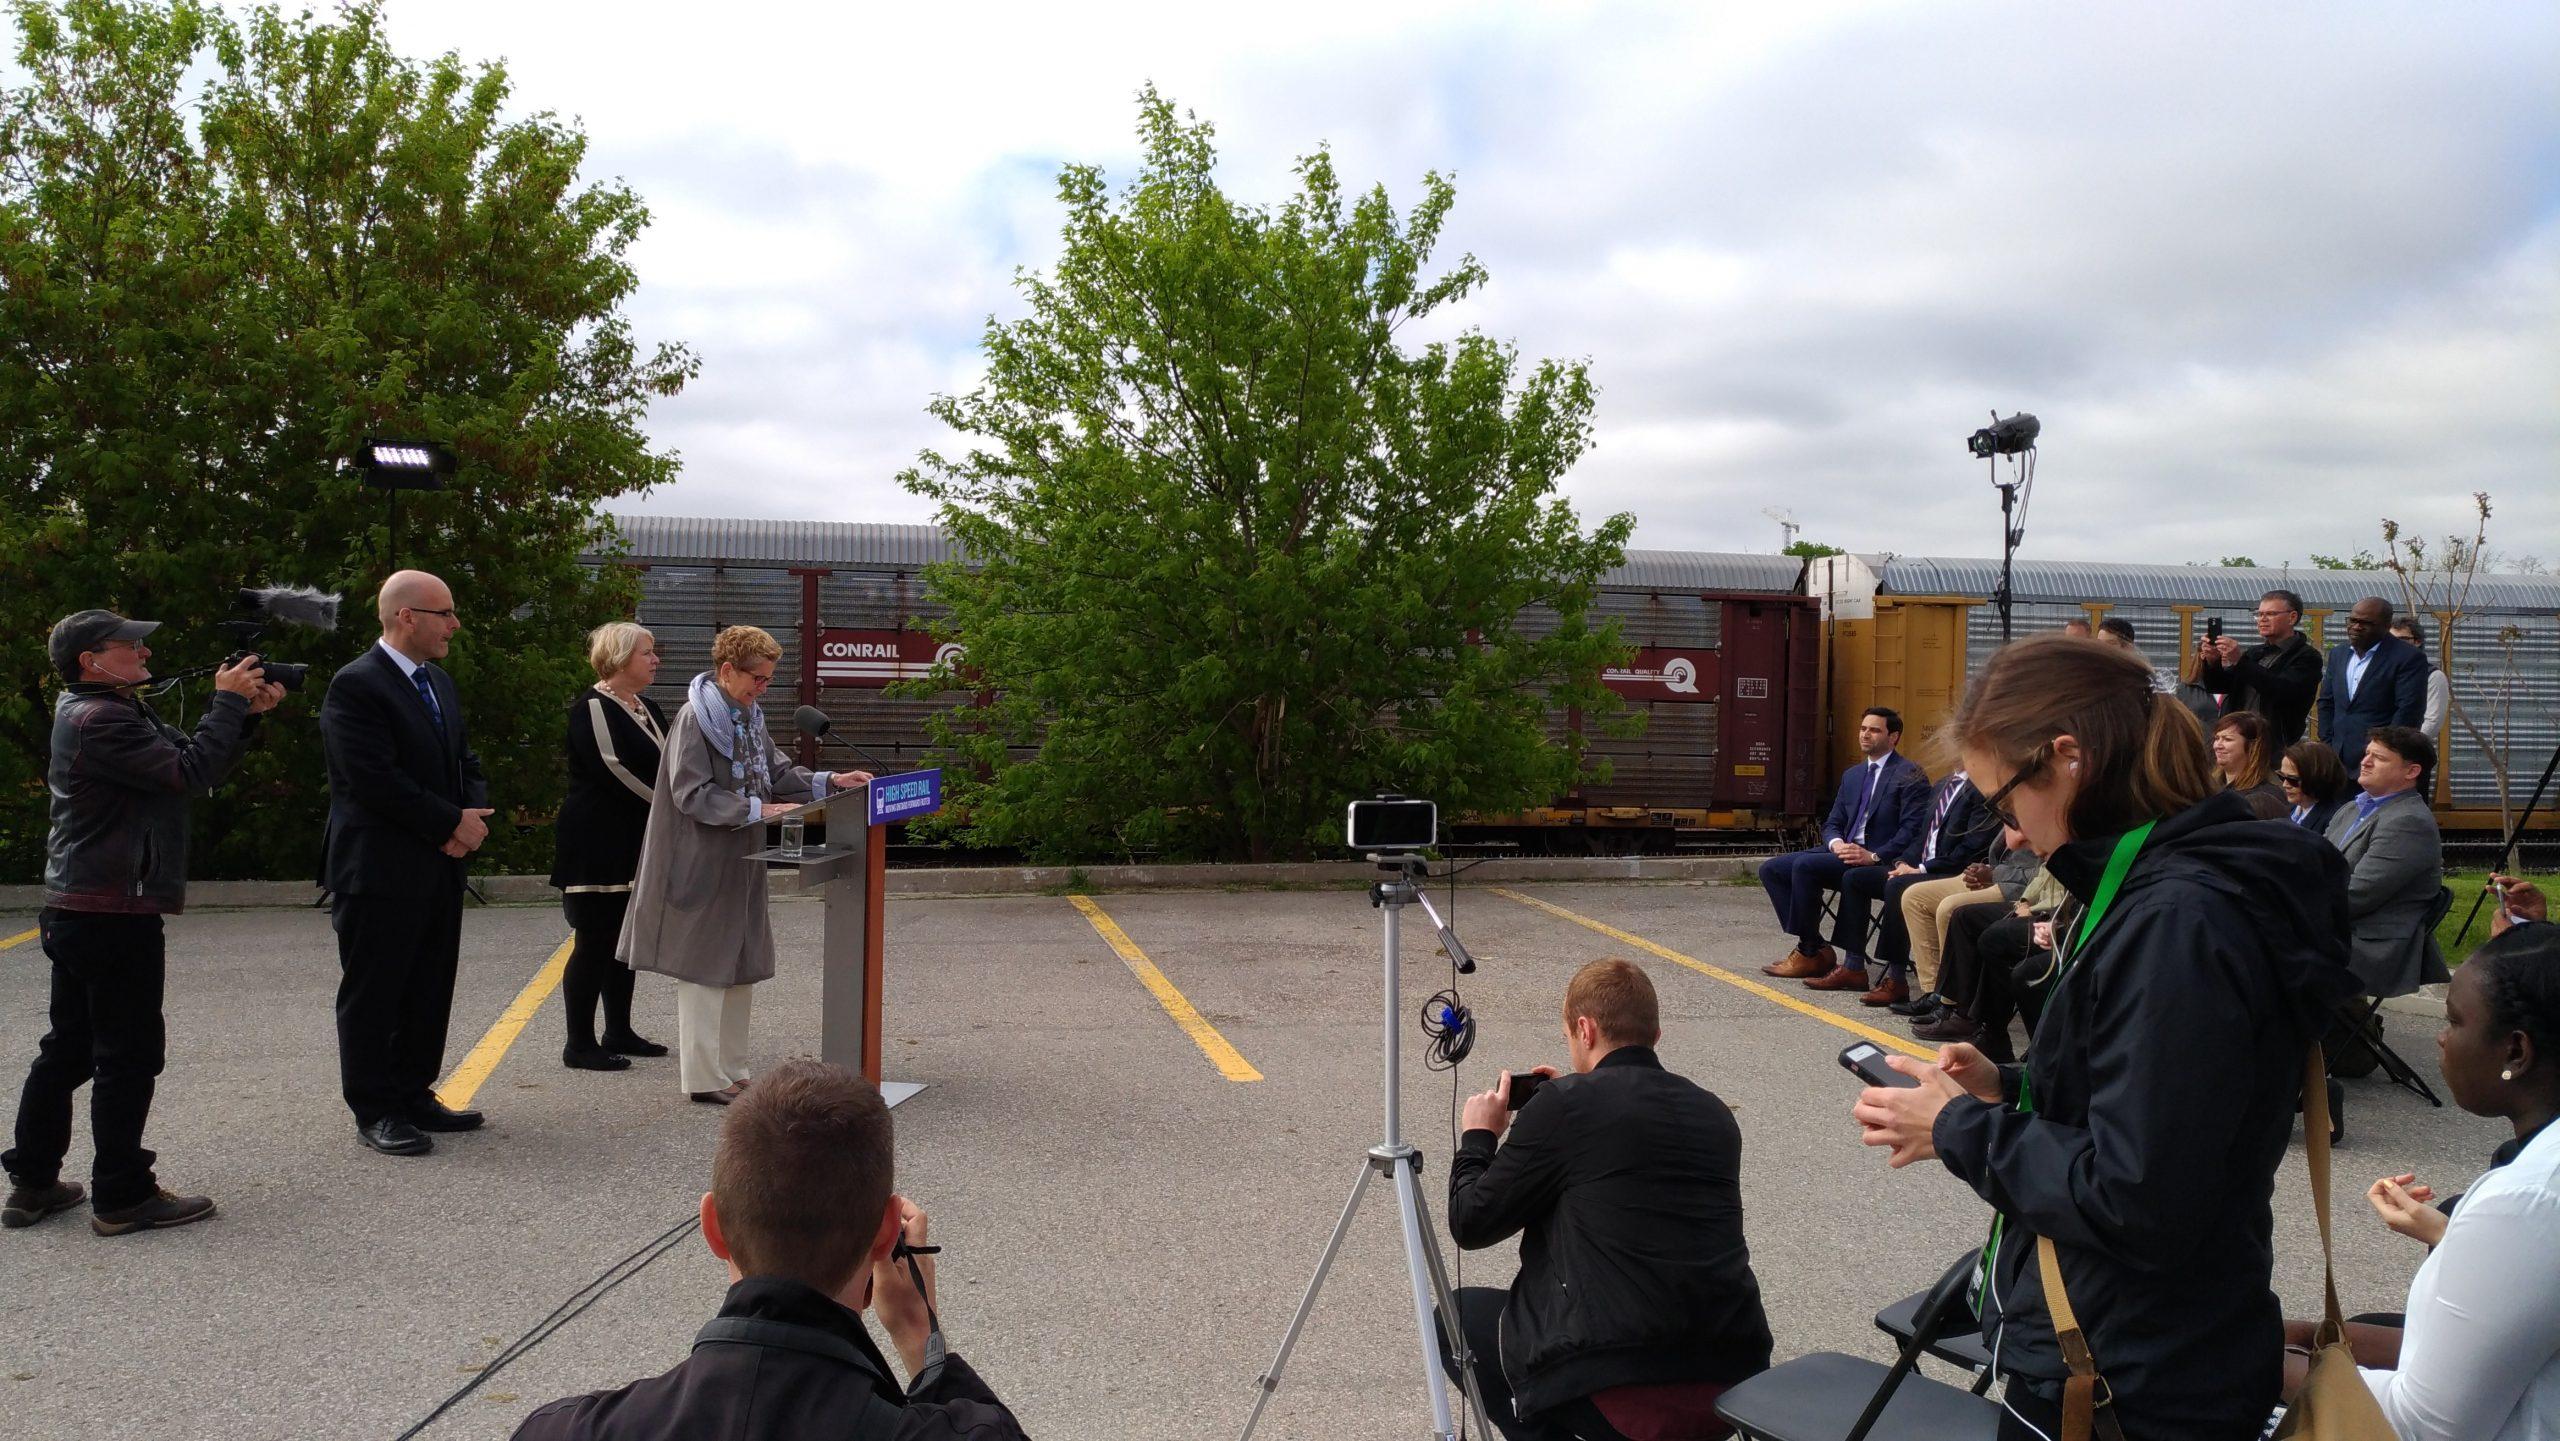 Premier Wynne Announces Plans for High Speed Rail